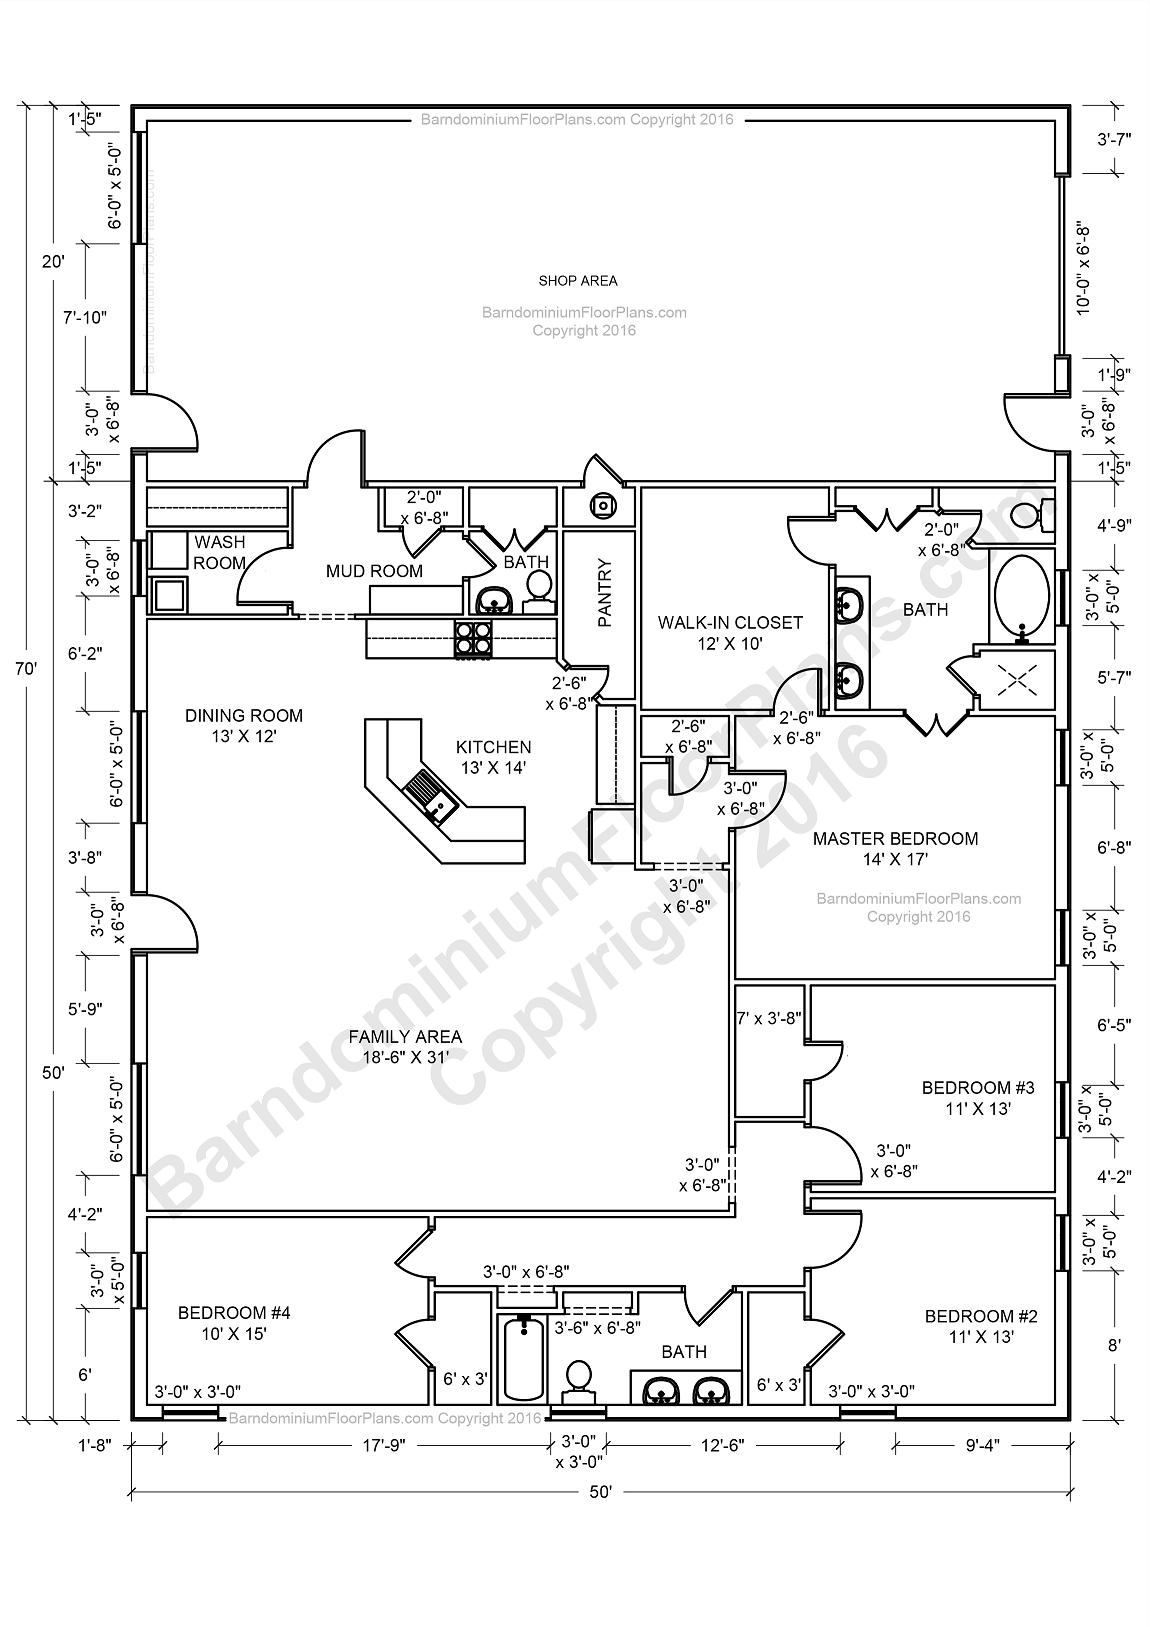 medium resolution of barndominium floor plans barndominium floor plans 1 800 691 8311